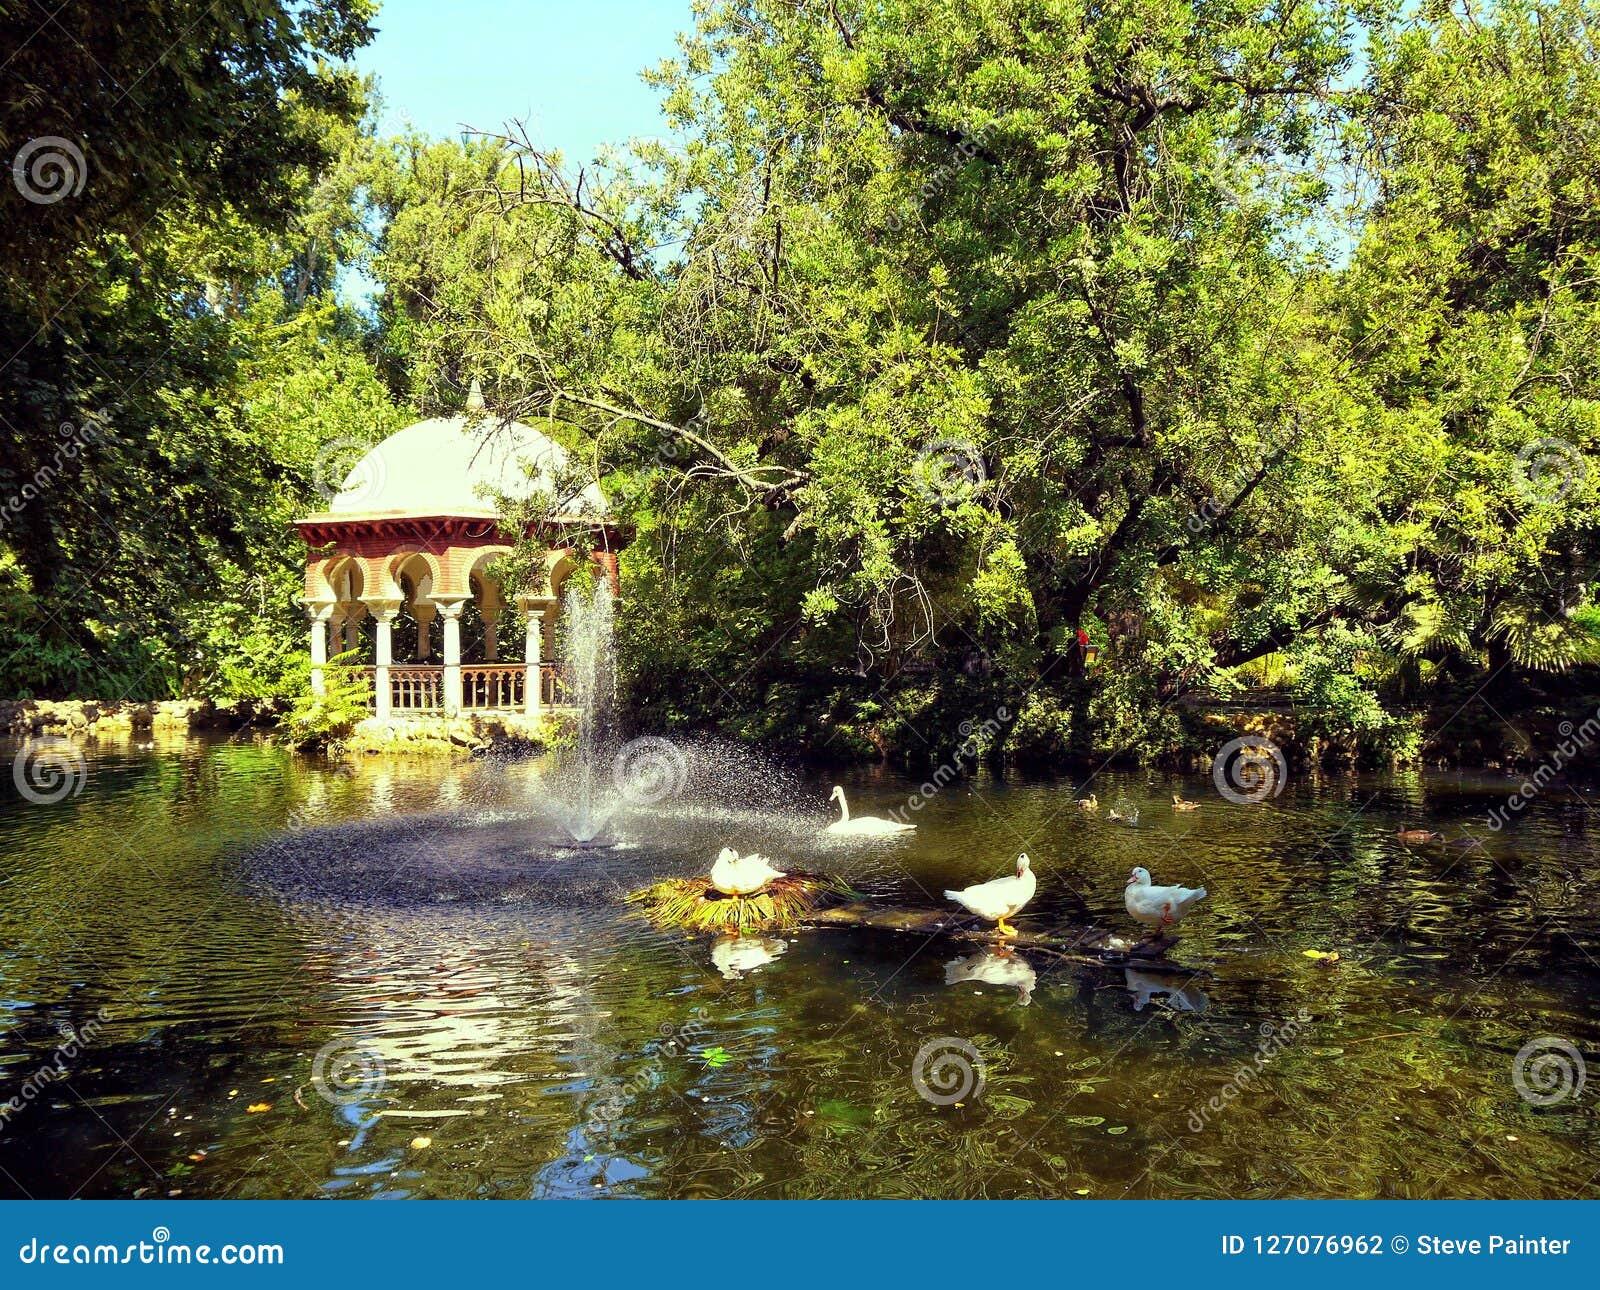 An ornate gazebo beside an ornamental duck pond.